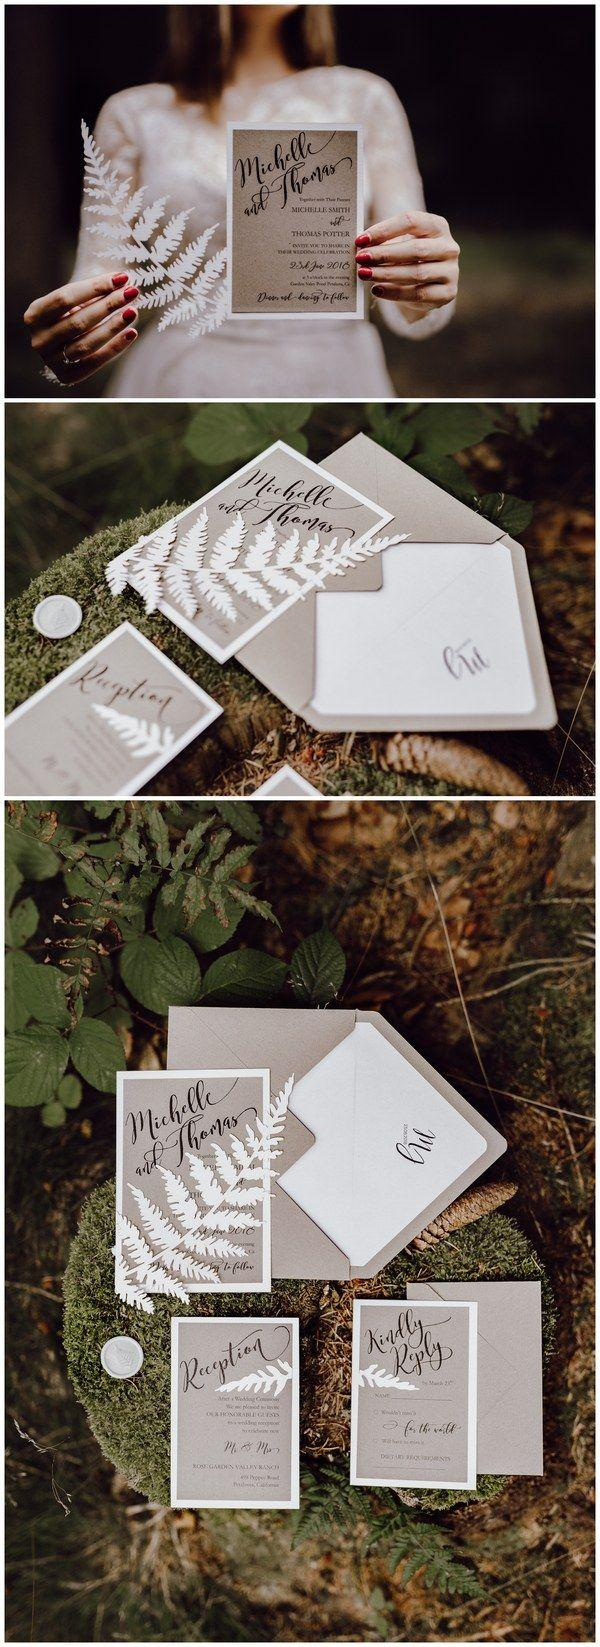 Mariage - Newest 35 Vintage & Botanical Wedding Inviations From 4LOVEPolkaDots